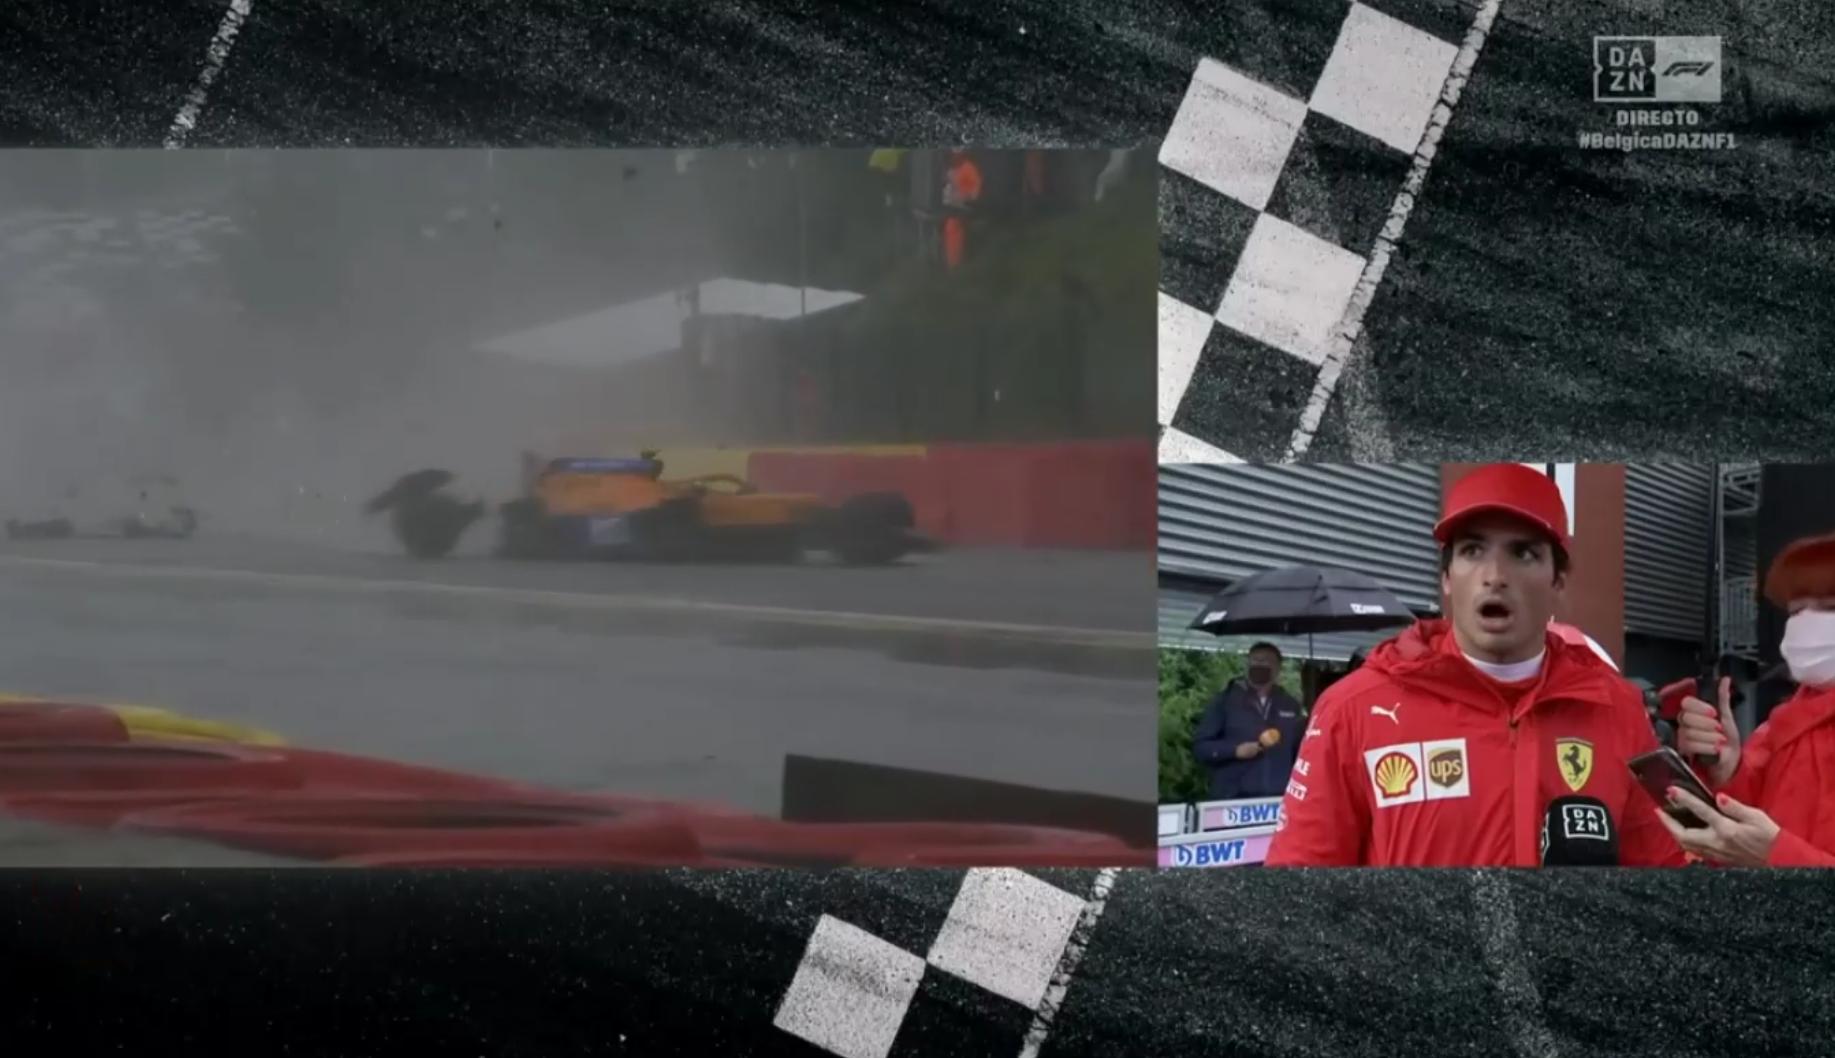 VIDEO: Carlos Sainz's Reaction When He Spotted Lando's Crash Live